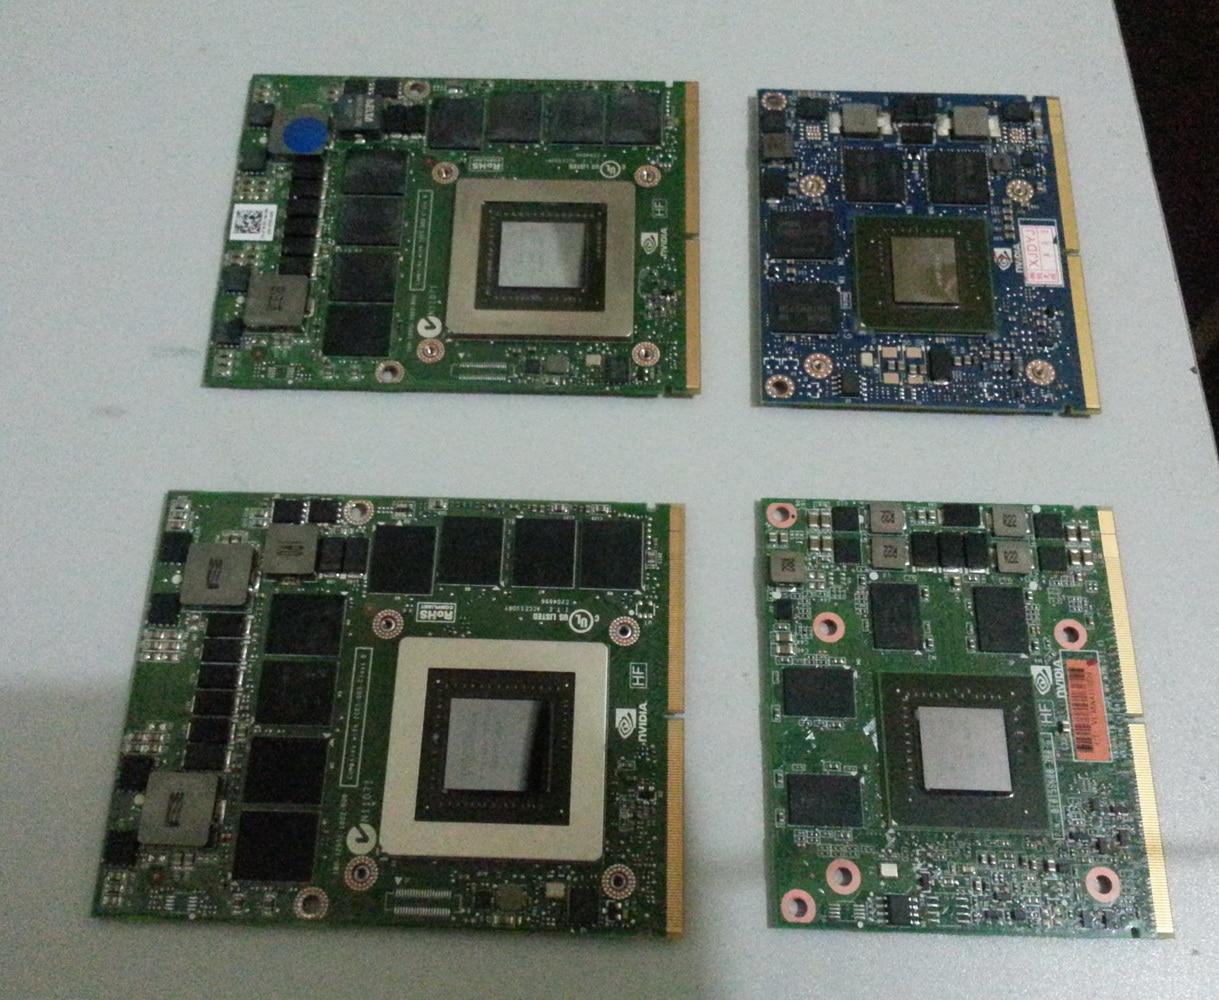 Aggressiv Neue Ersatzteile Quadro K3000m 2 Gb N14e-q1-a2 0x5ffm Grafikkarte Garantie 1 Jahr